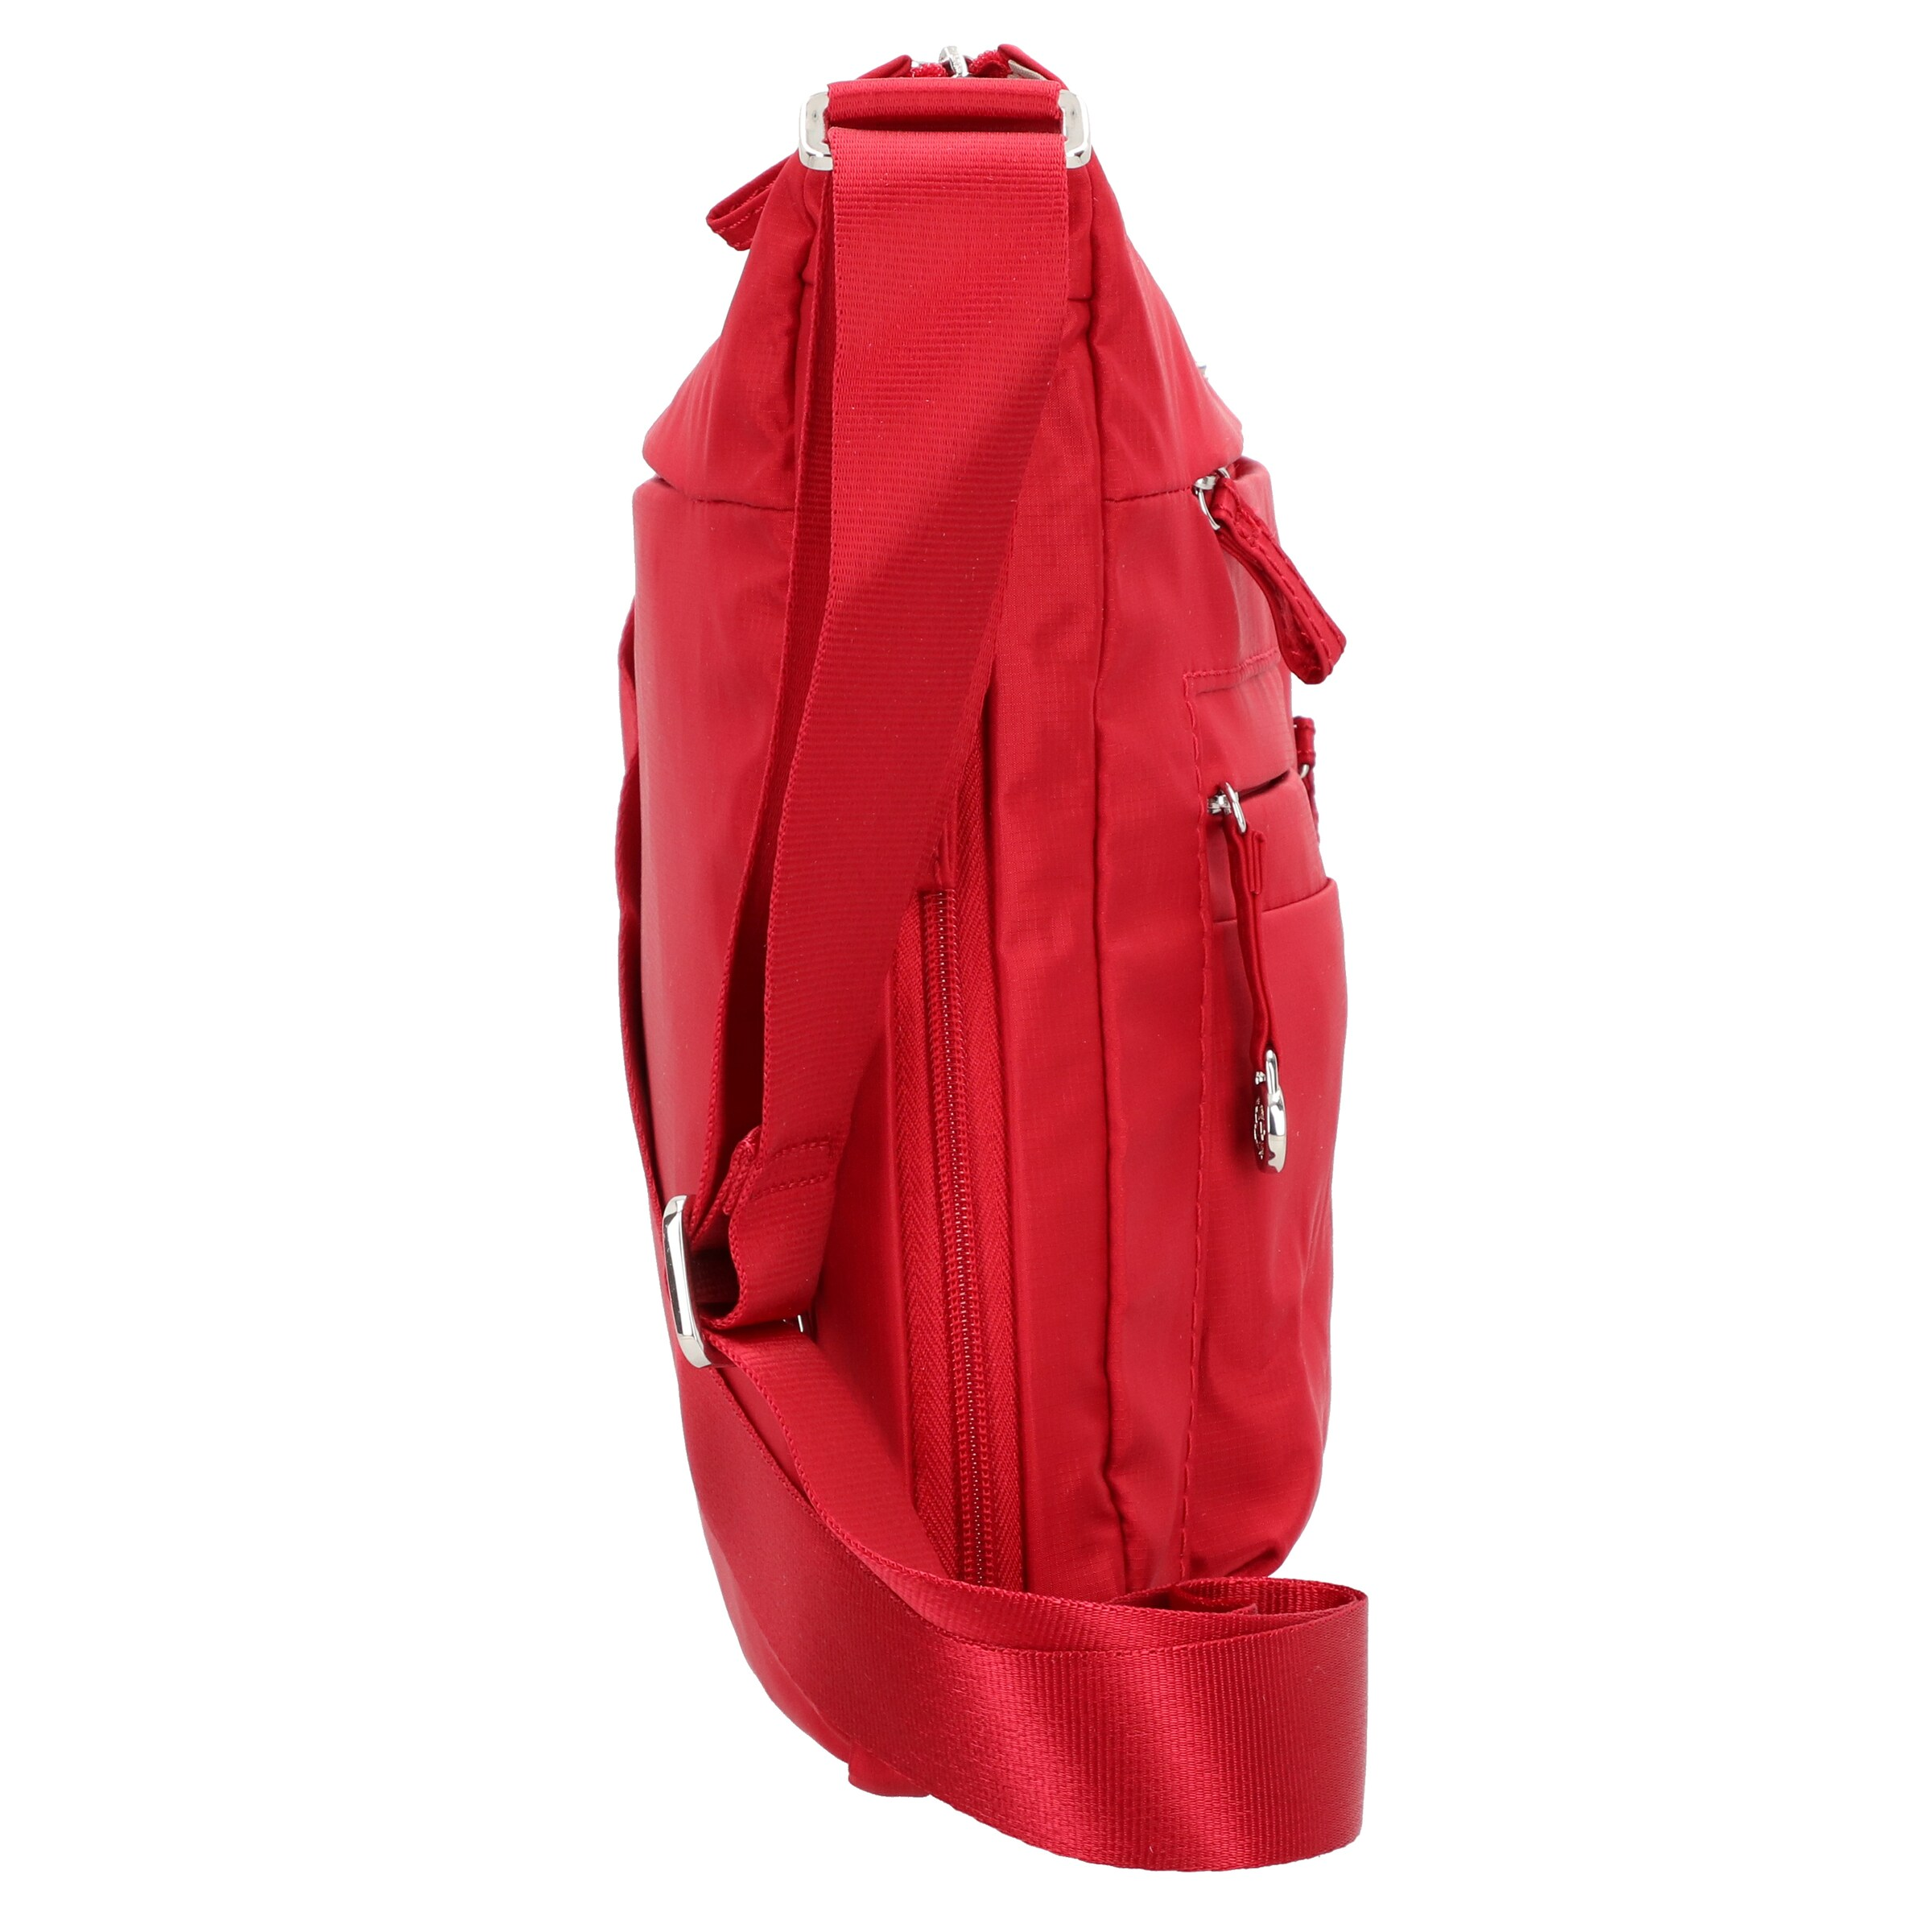 Tasche In Rot Samsonite In Rot Rot Samsonite In Tasche Samsonite Samsonite Tasche Tasche dCBrxoe